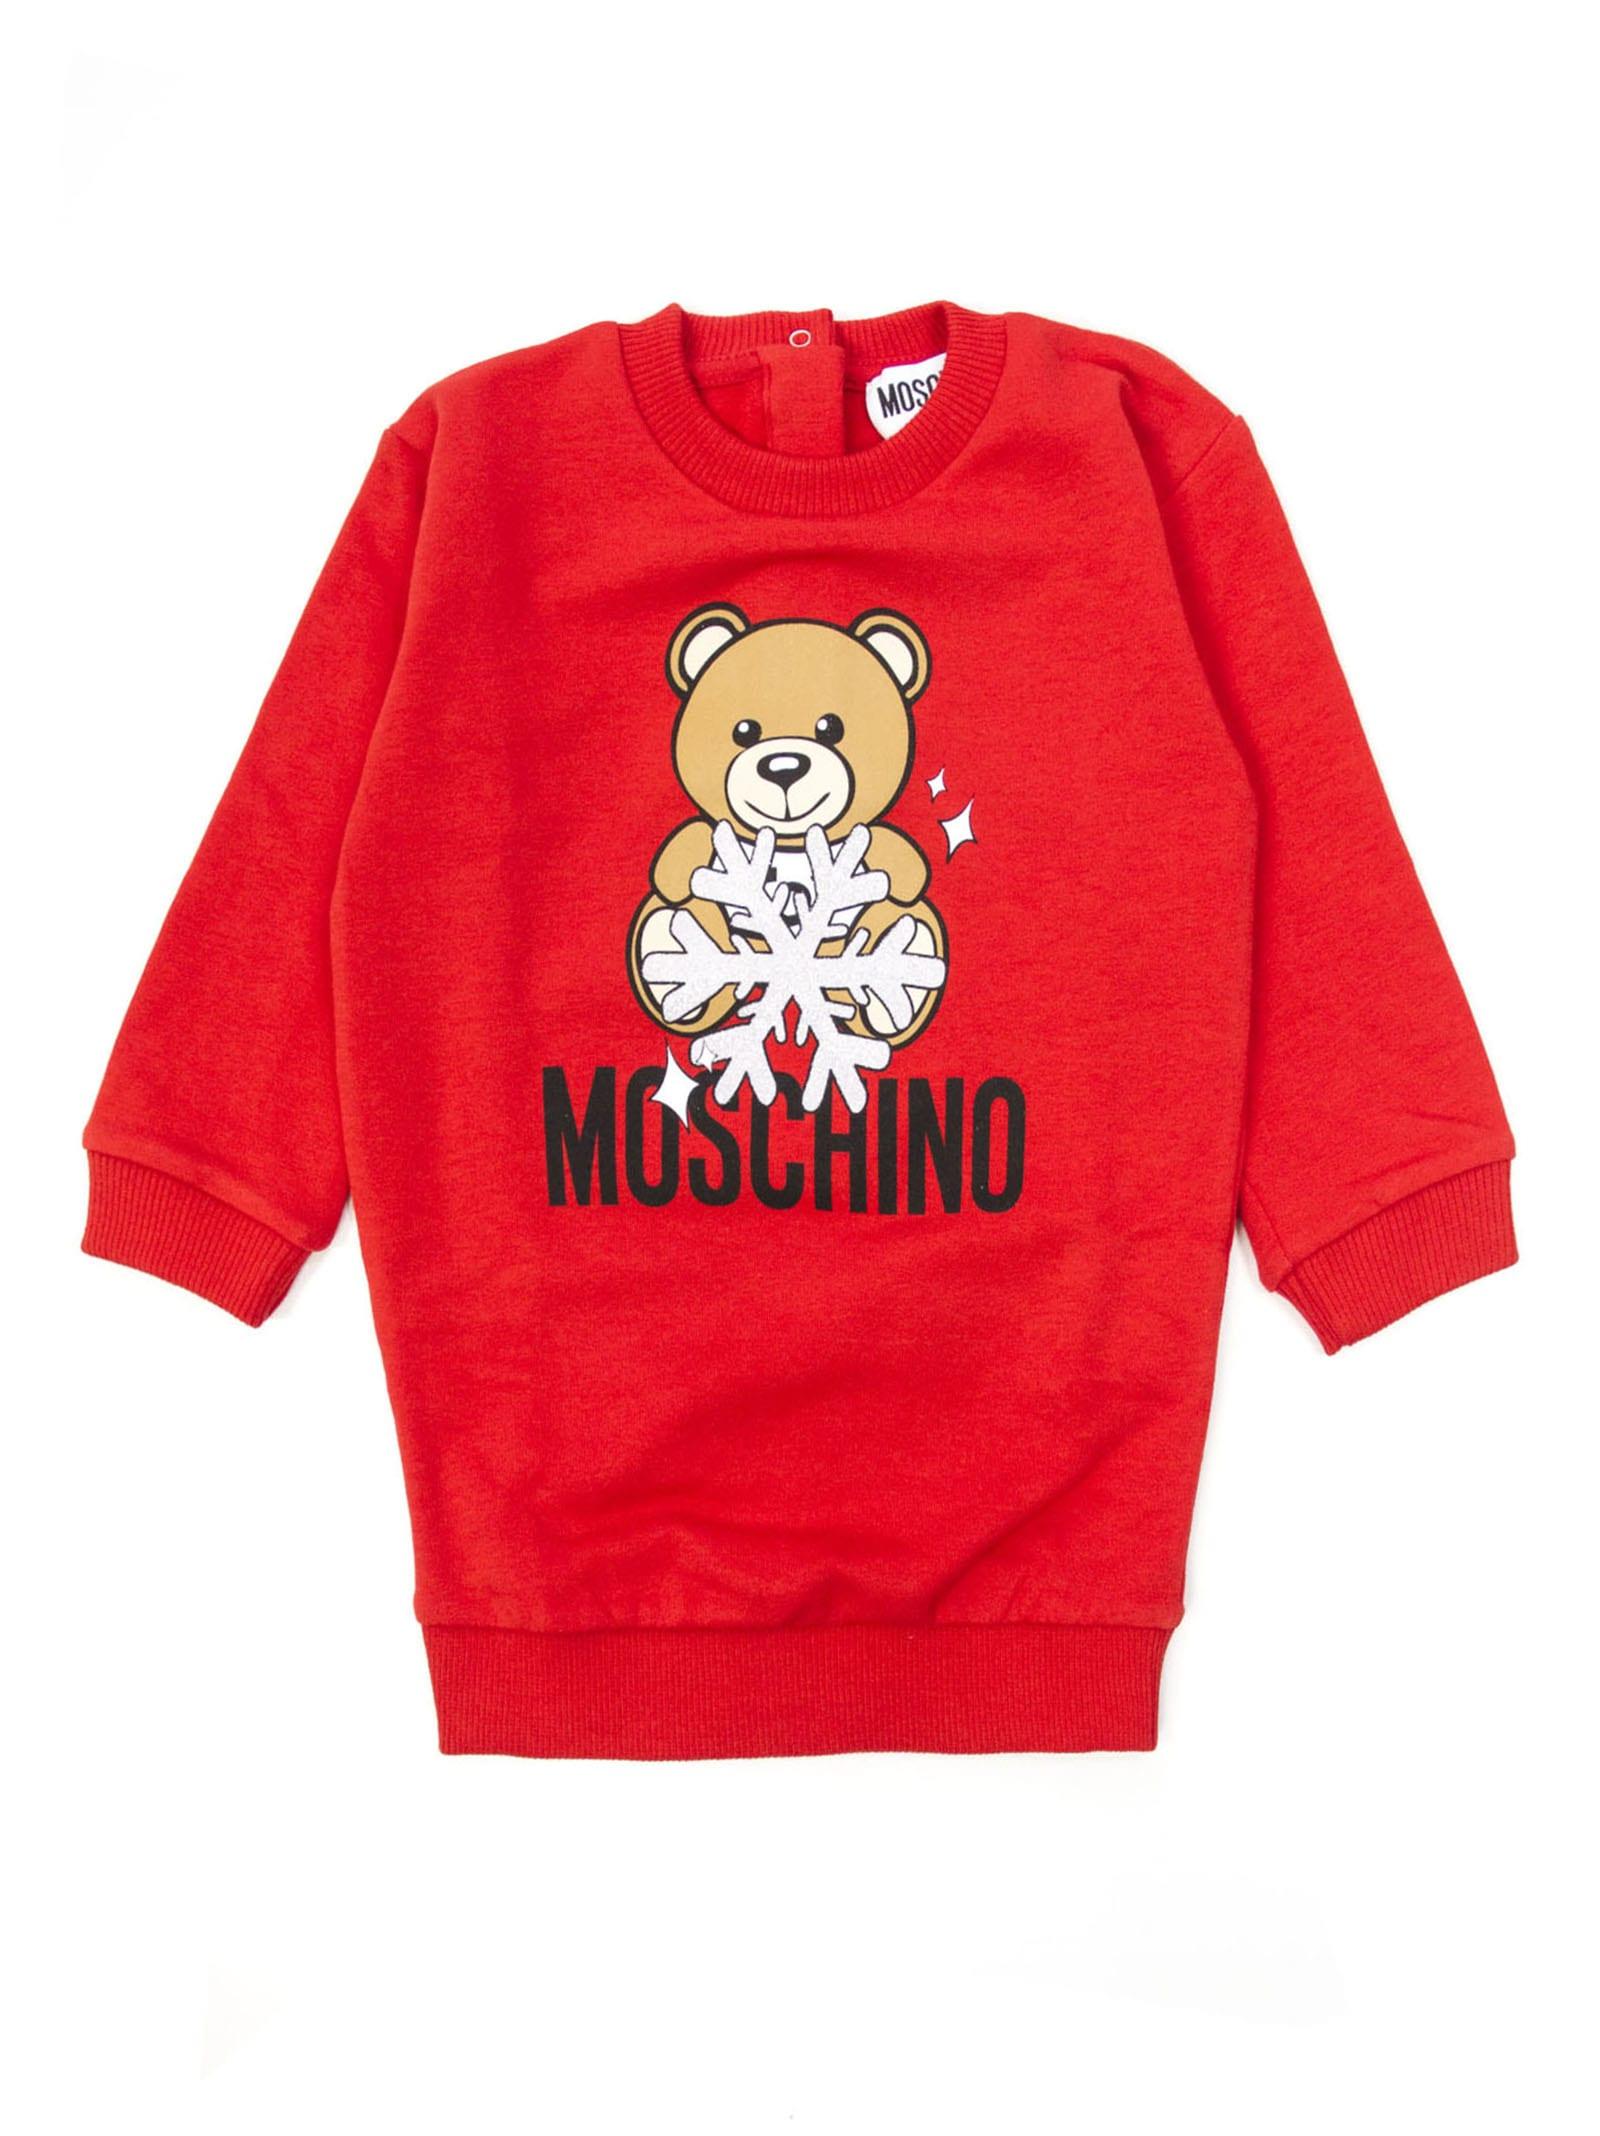 Moschino Red Cotton Sweatshirt Dress